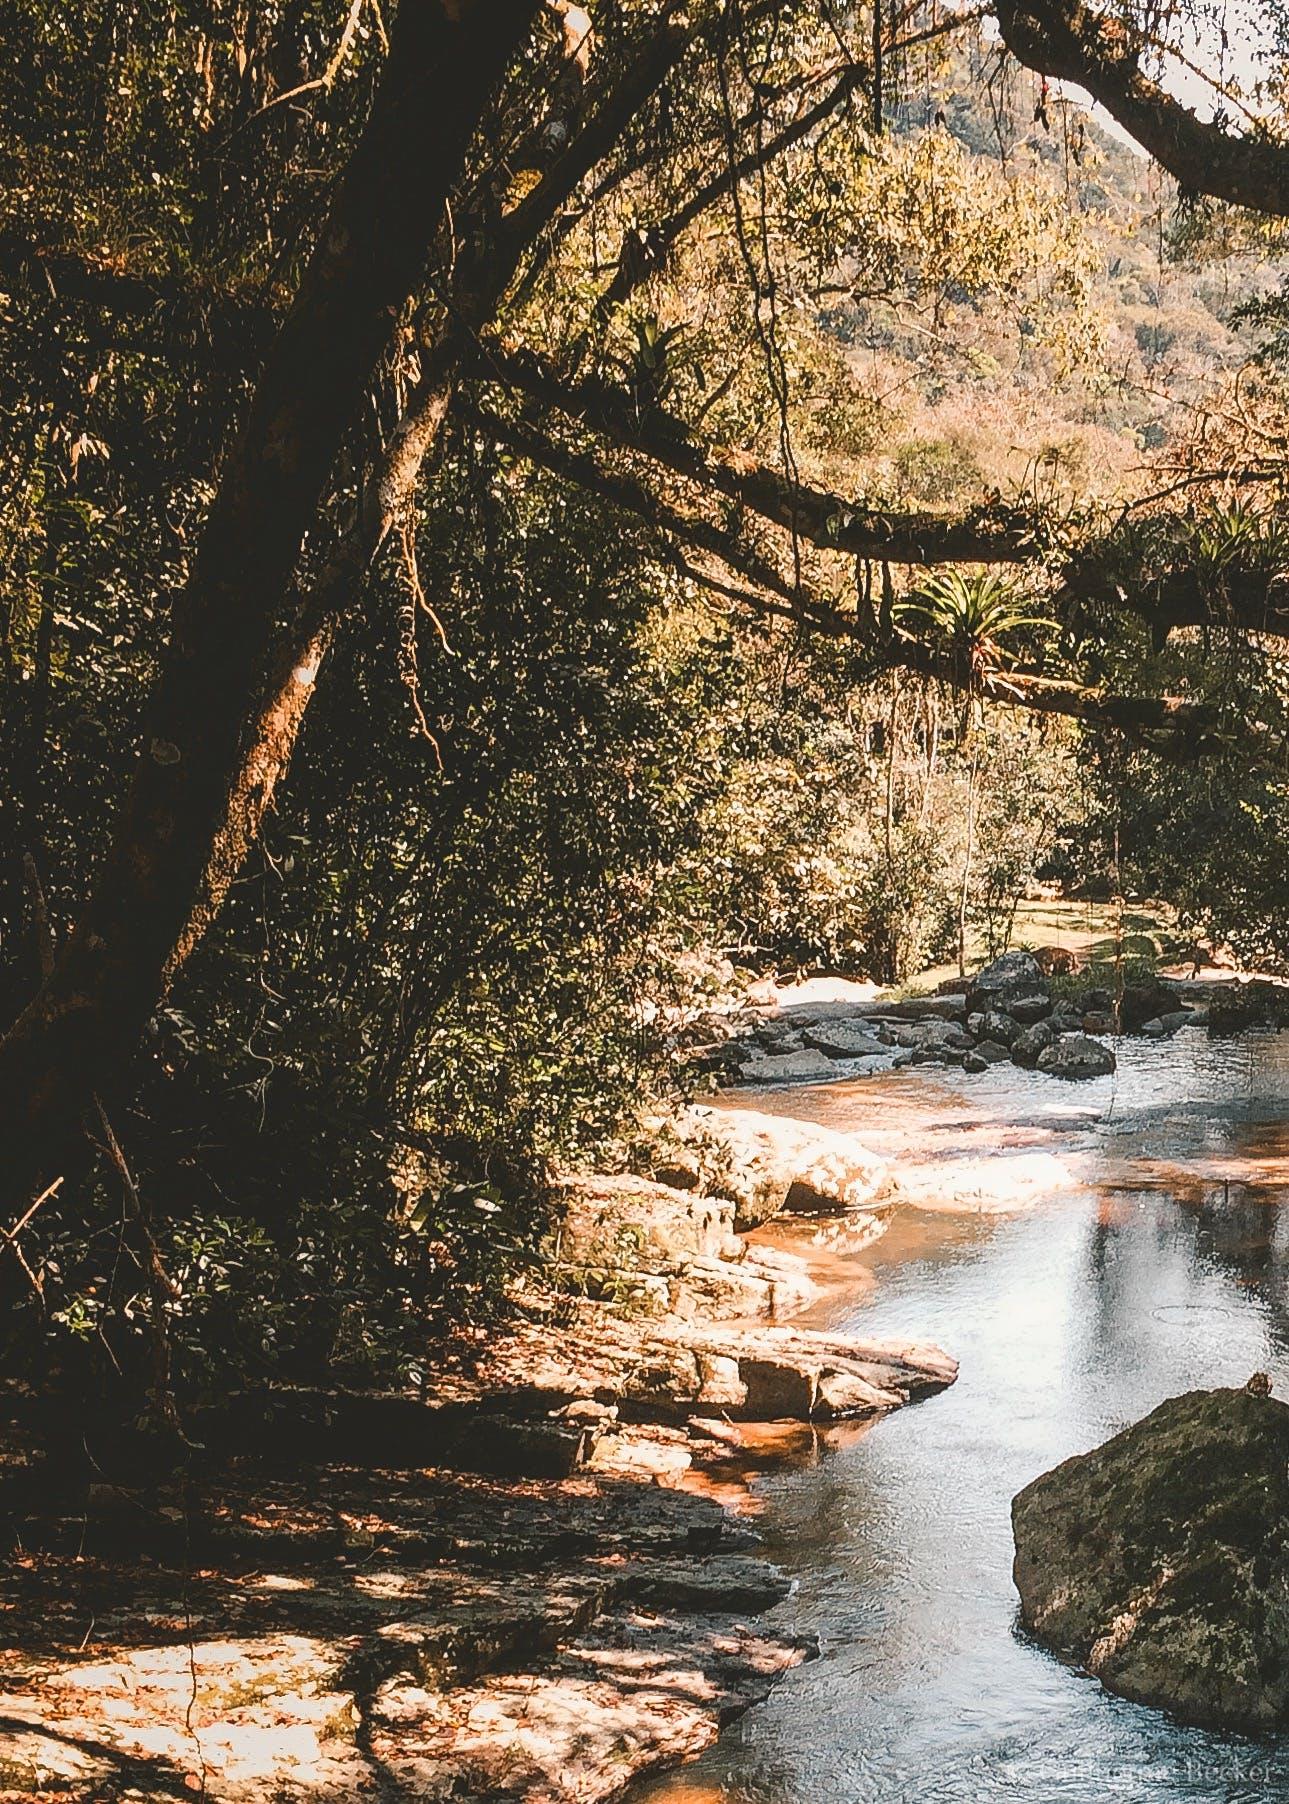 Free stock photo of life, nature, travel